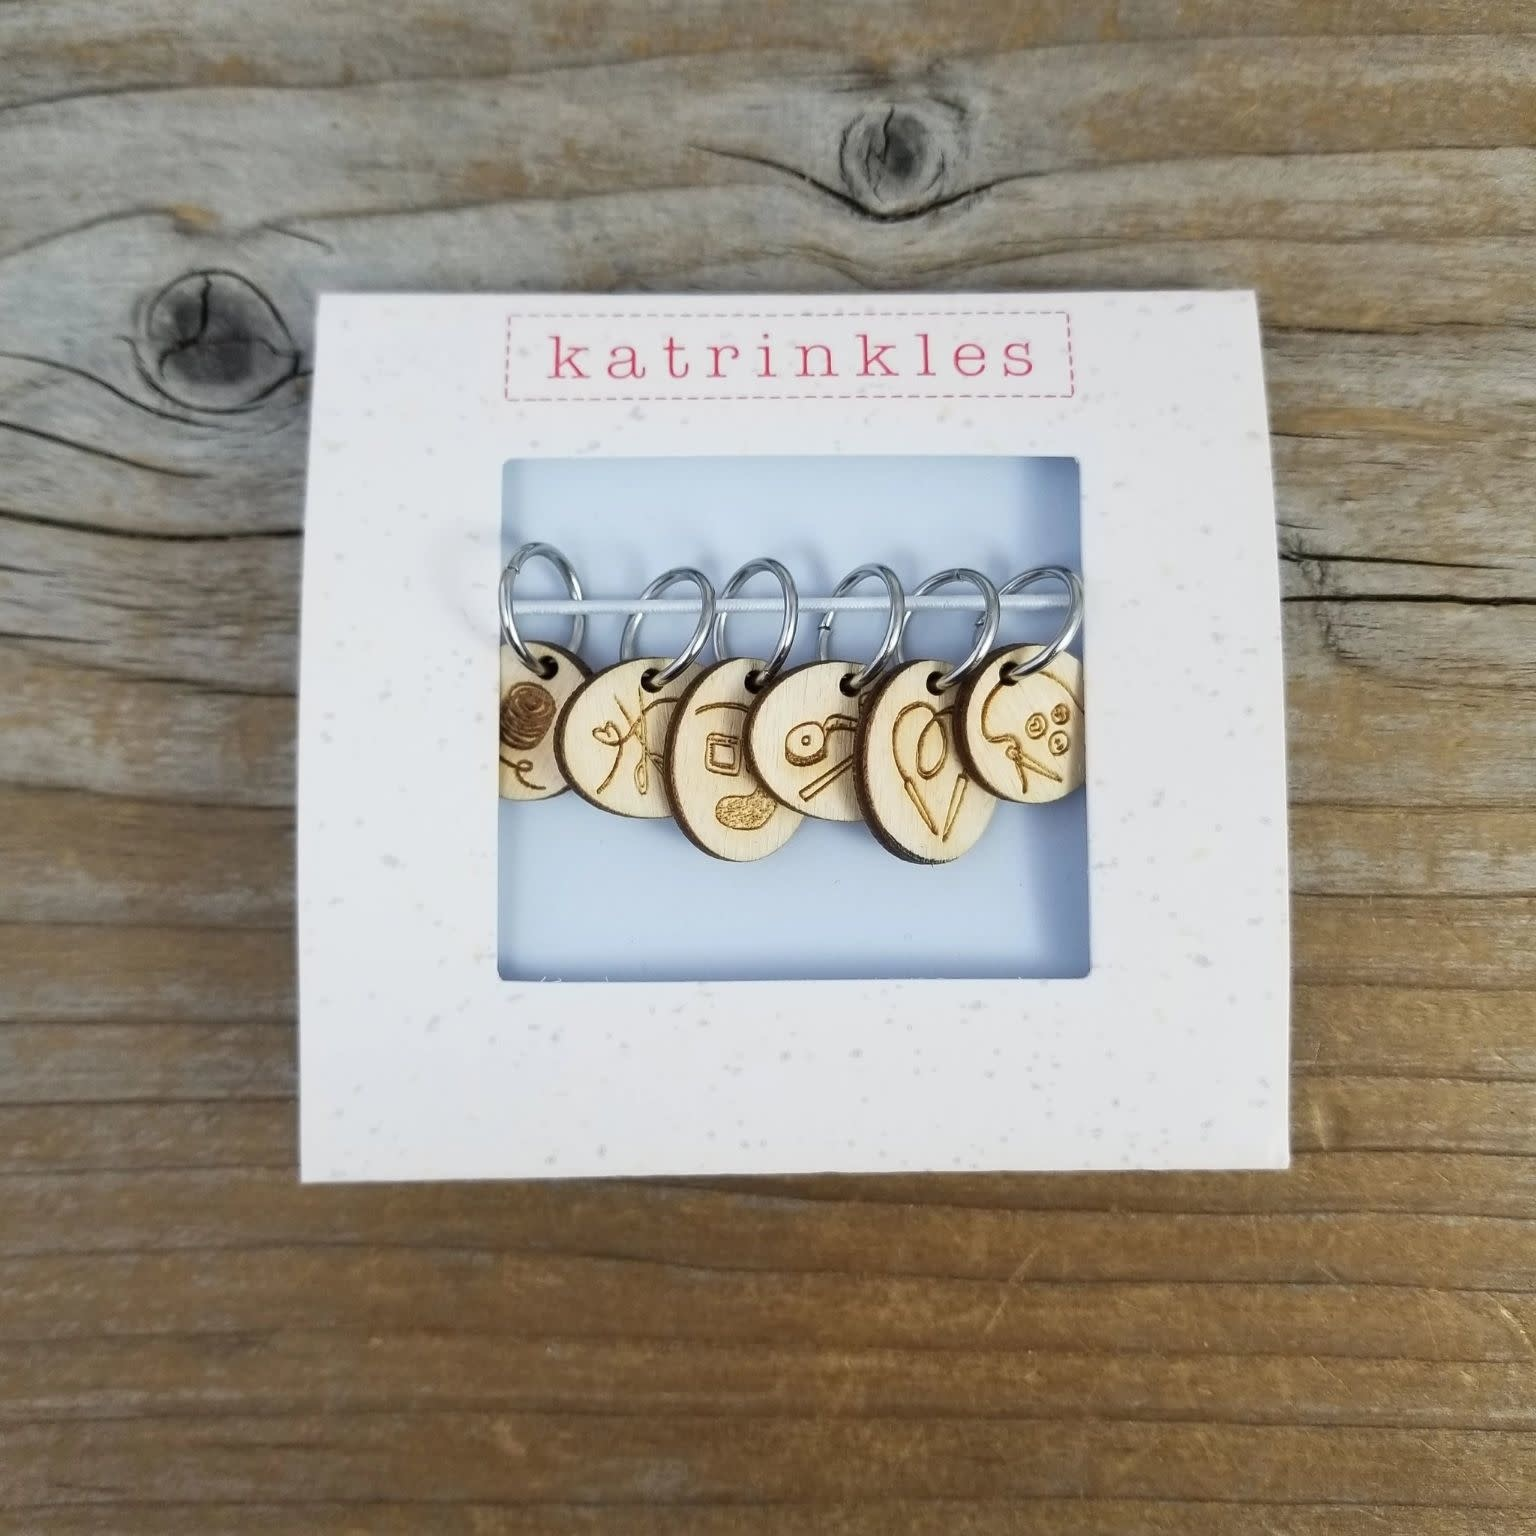 Katrinkles Katrinkles LYS Yarn & Notions Stitch Markers-Limited Edition